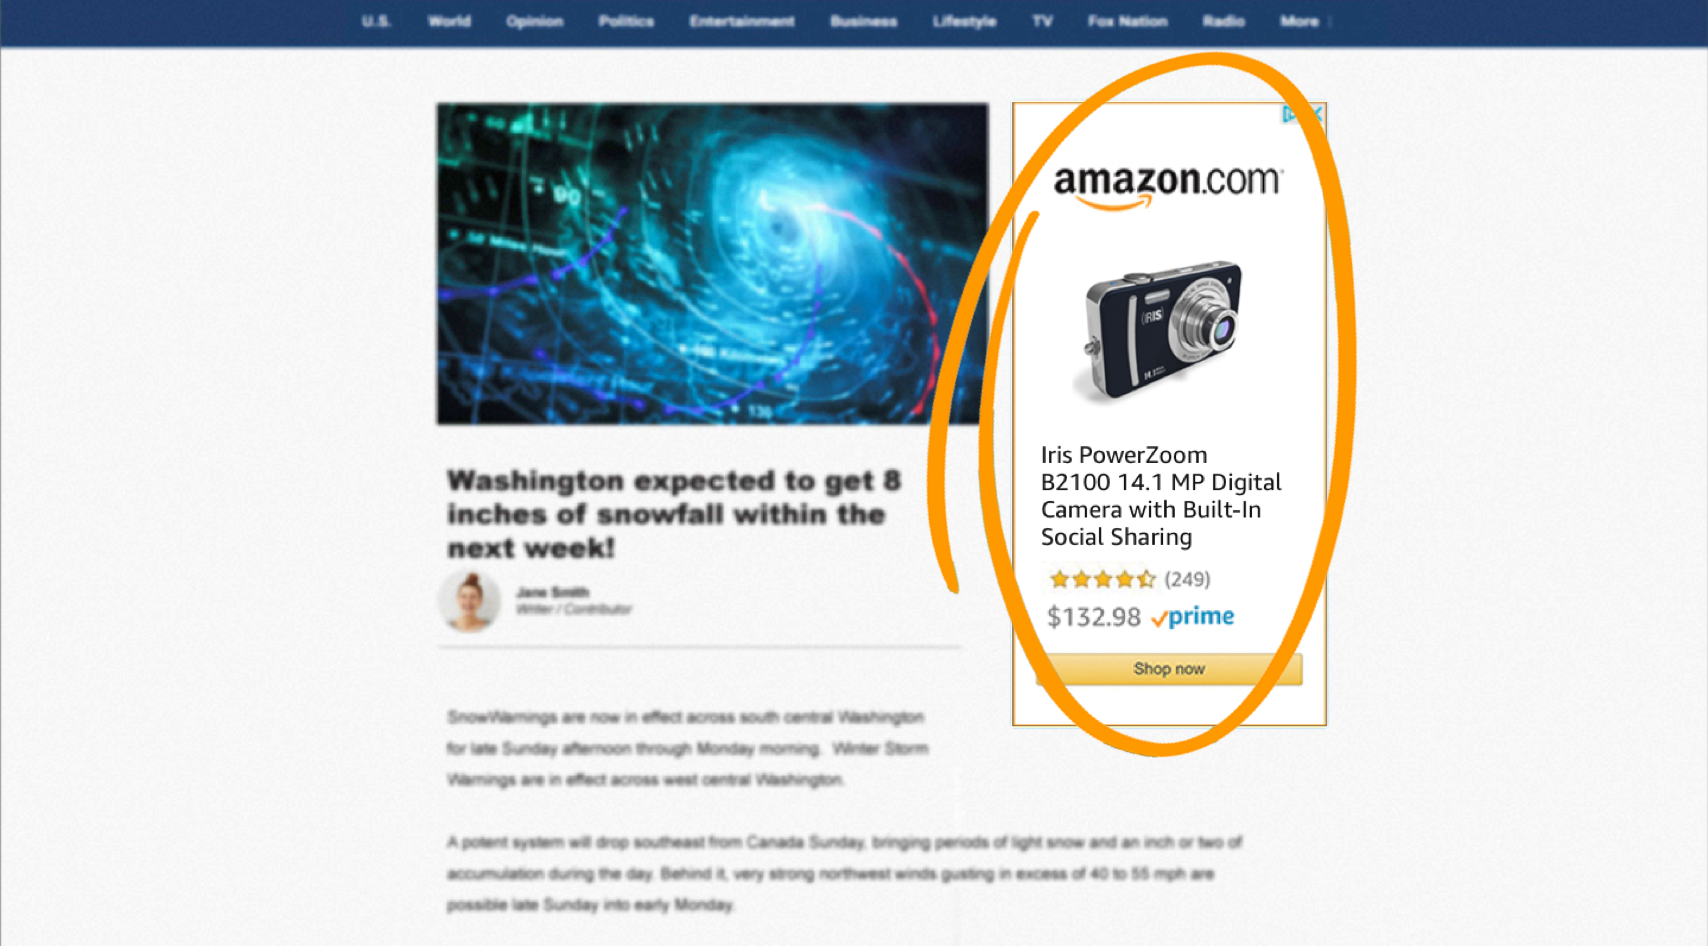 Amazon: Sponsored Display